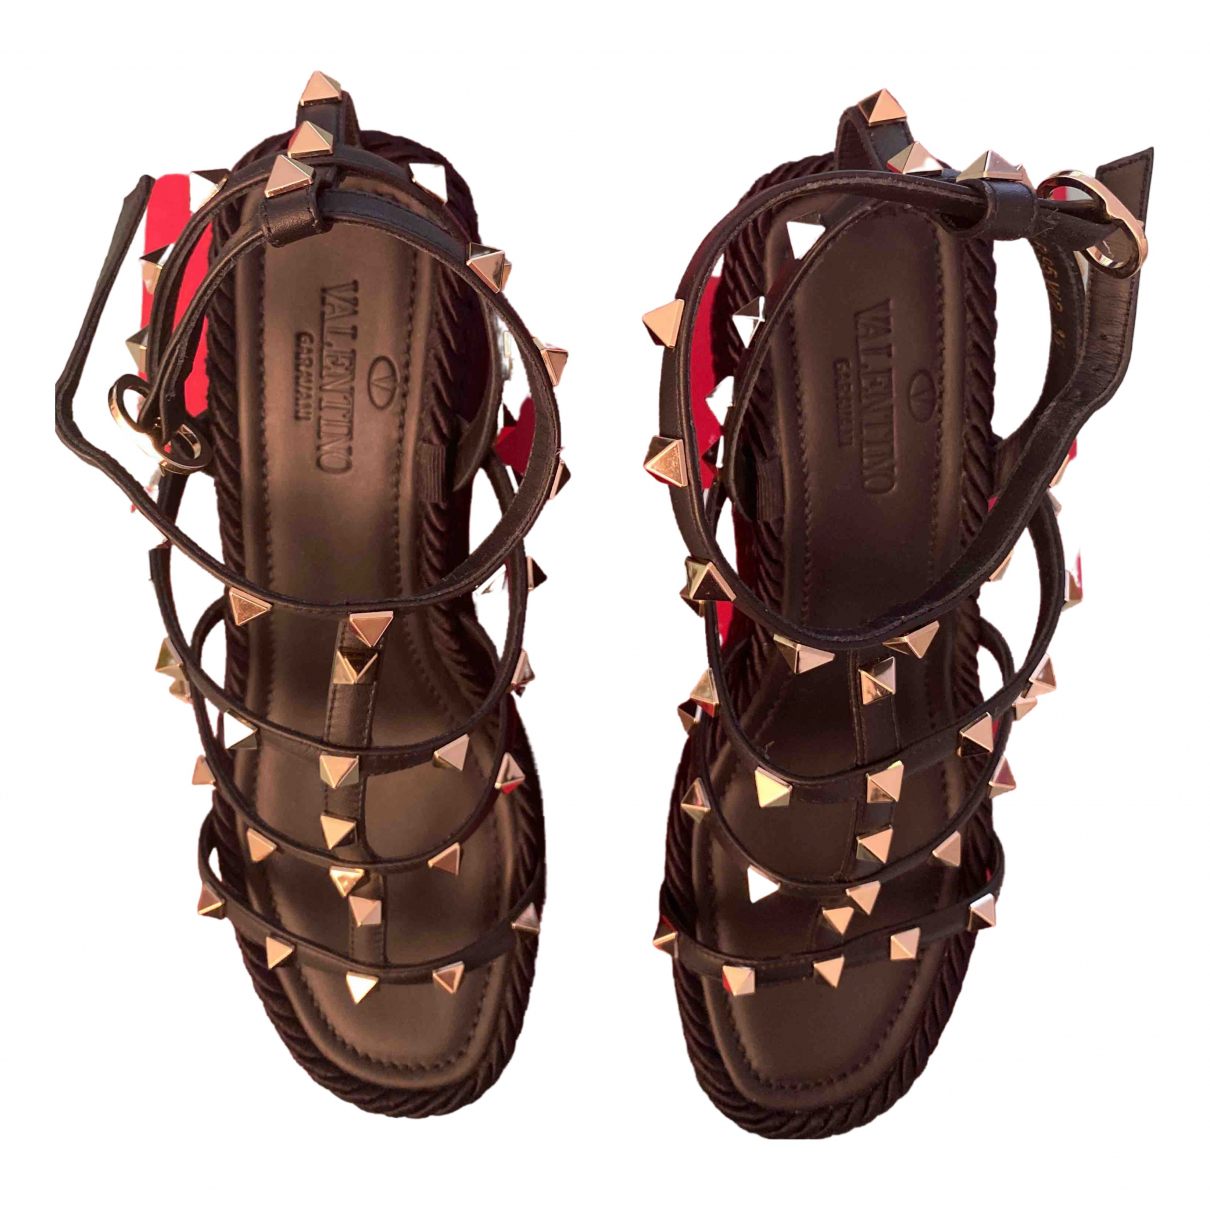 Valentino Garavani Rockstud Black Leather Sandals for Women 38 EU